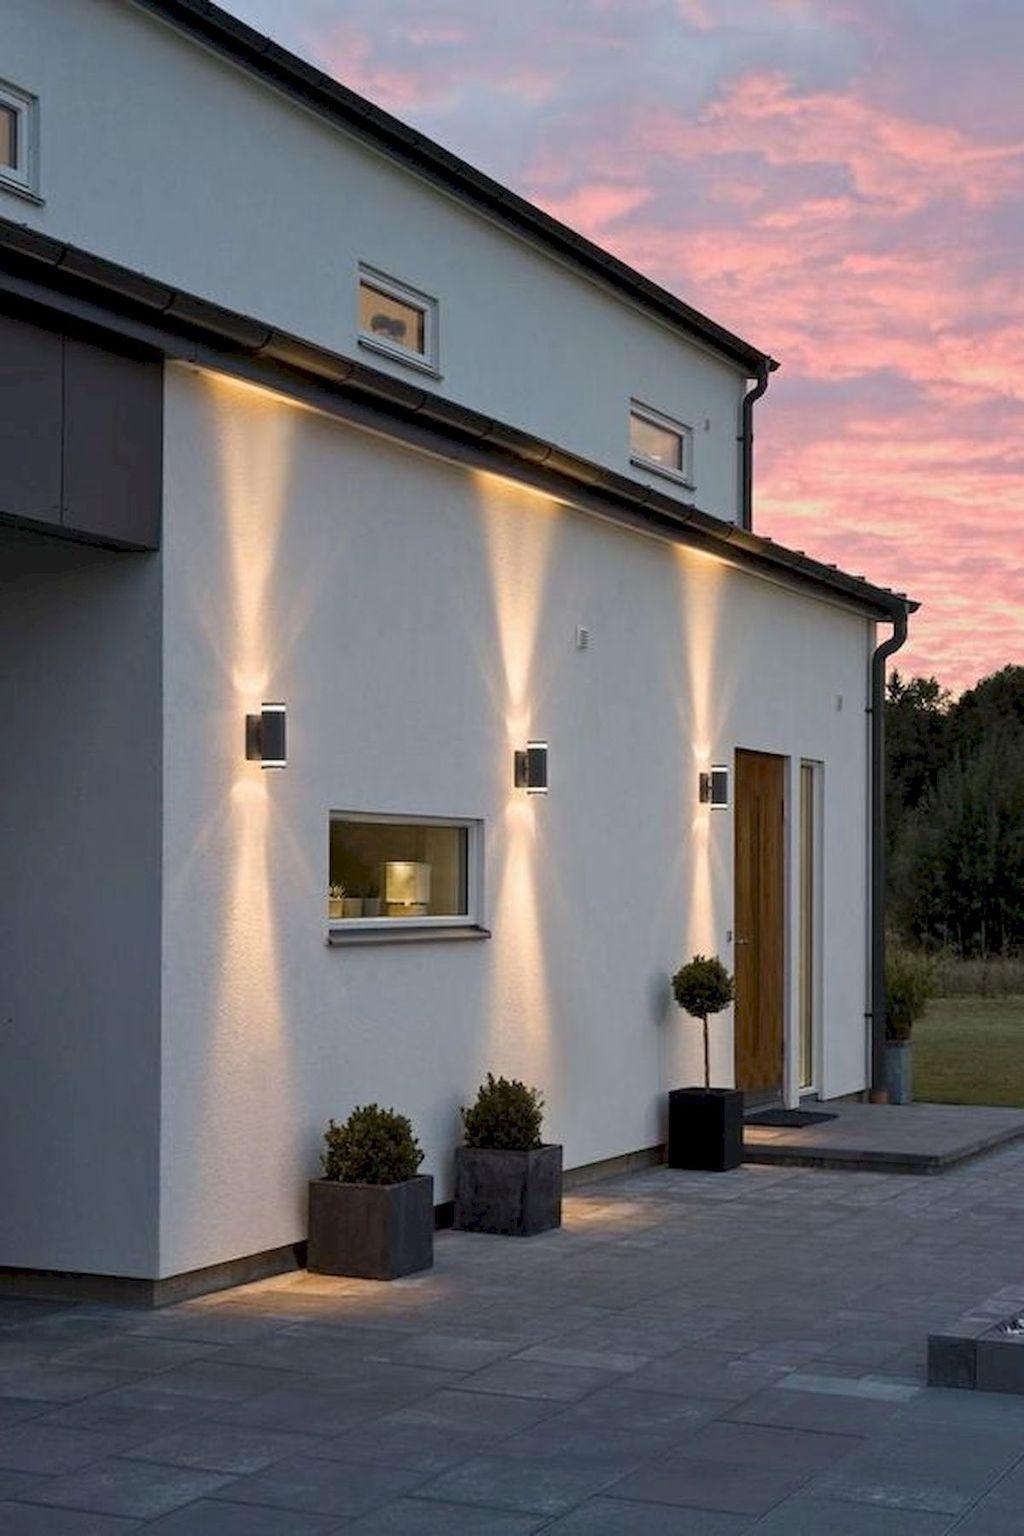 30 Marvelous Garden Lighting Design Ideas Exterior House Lights